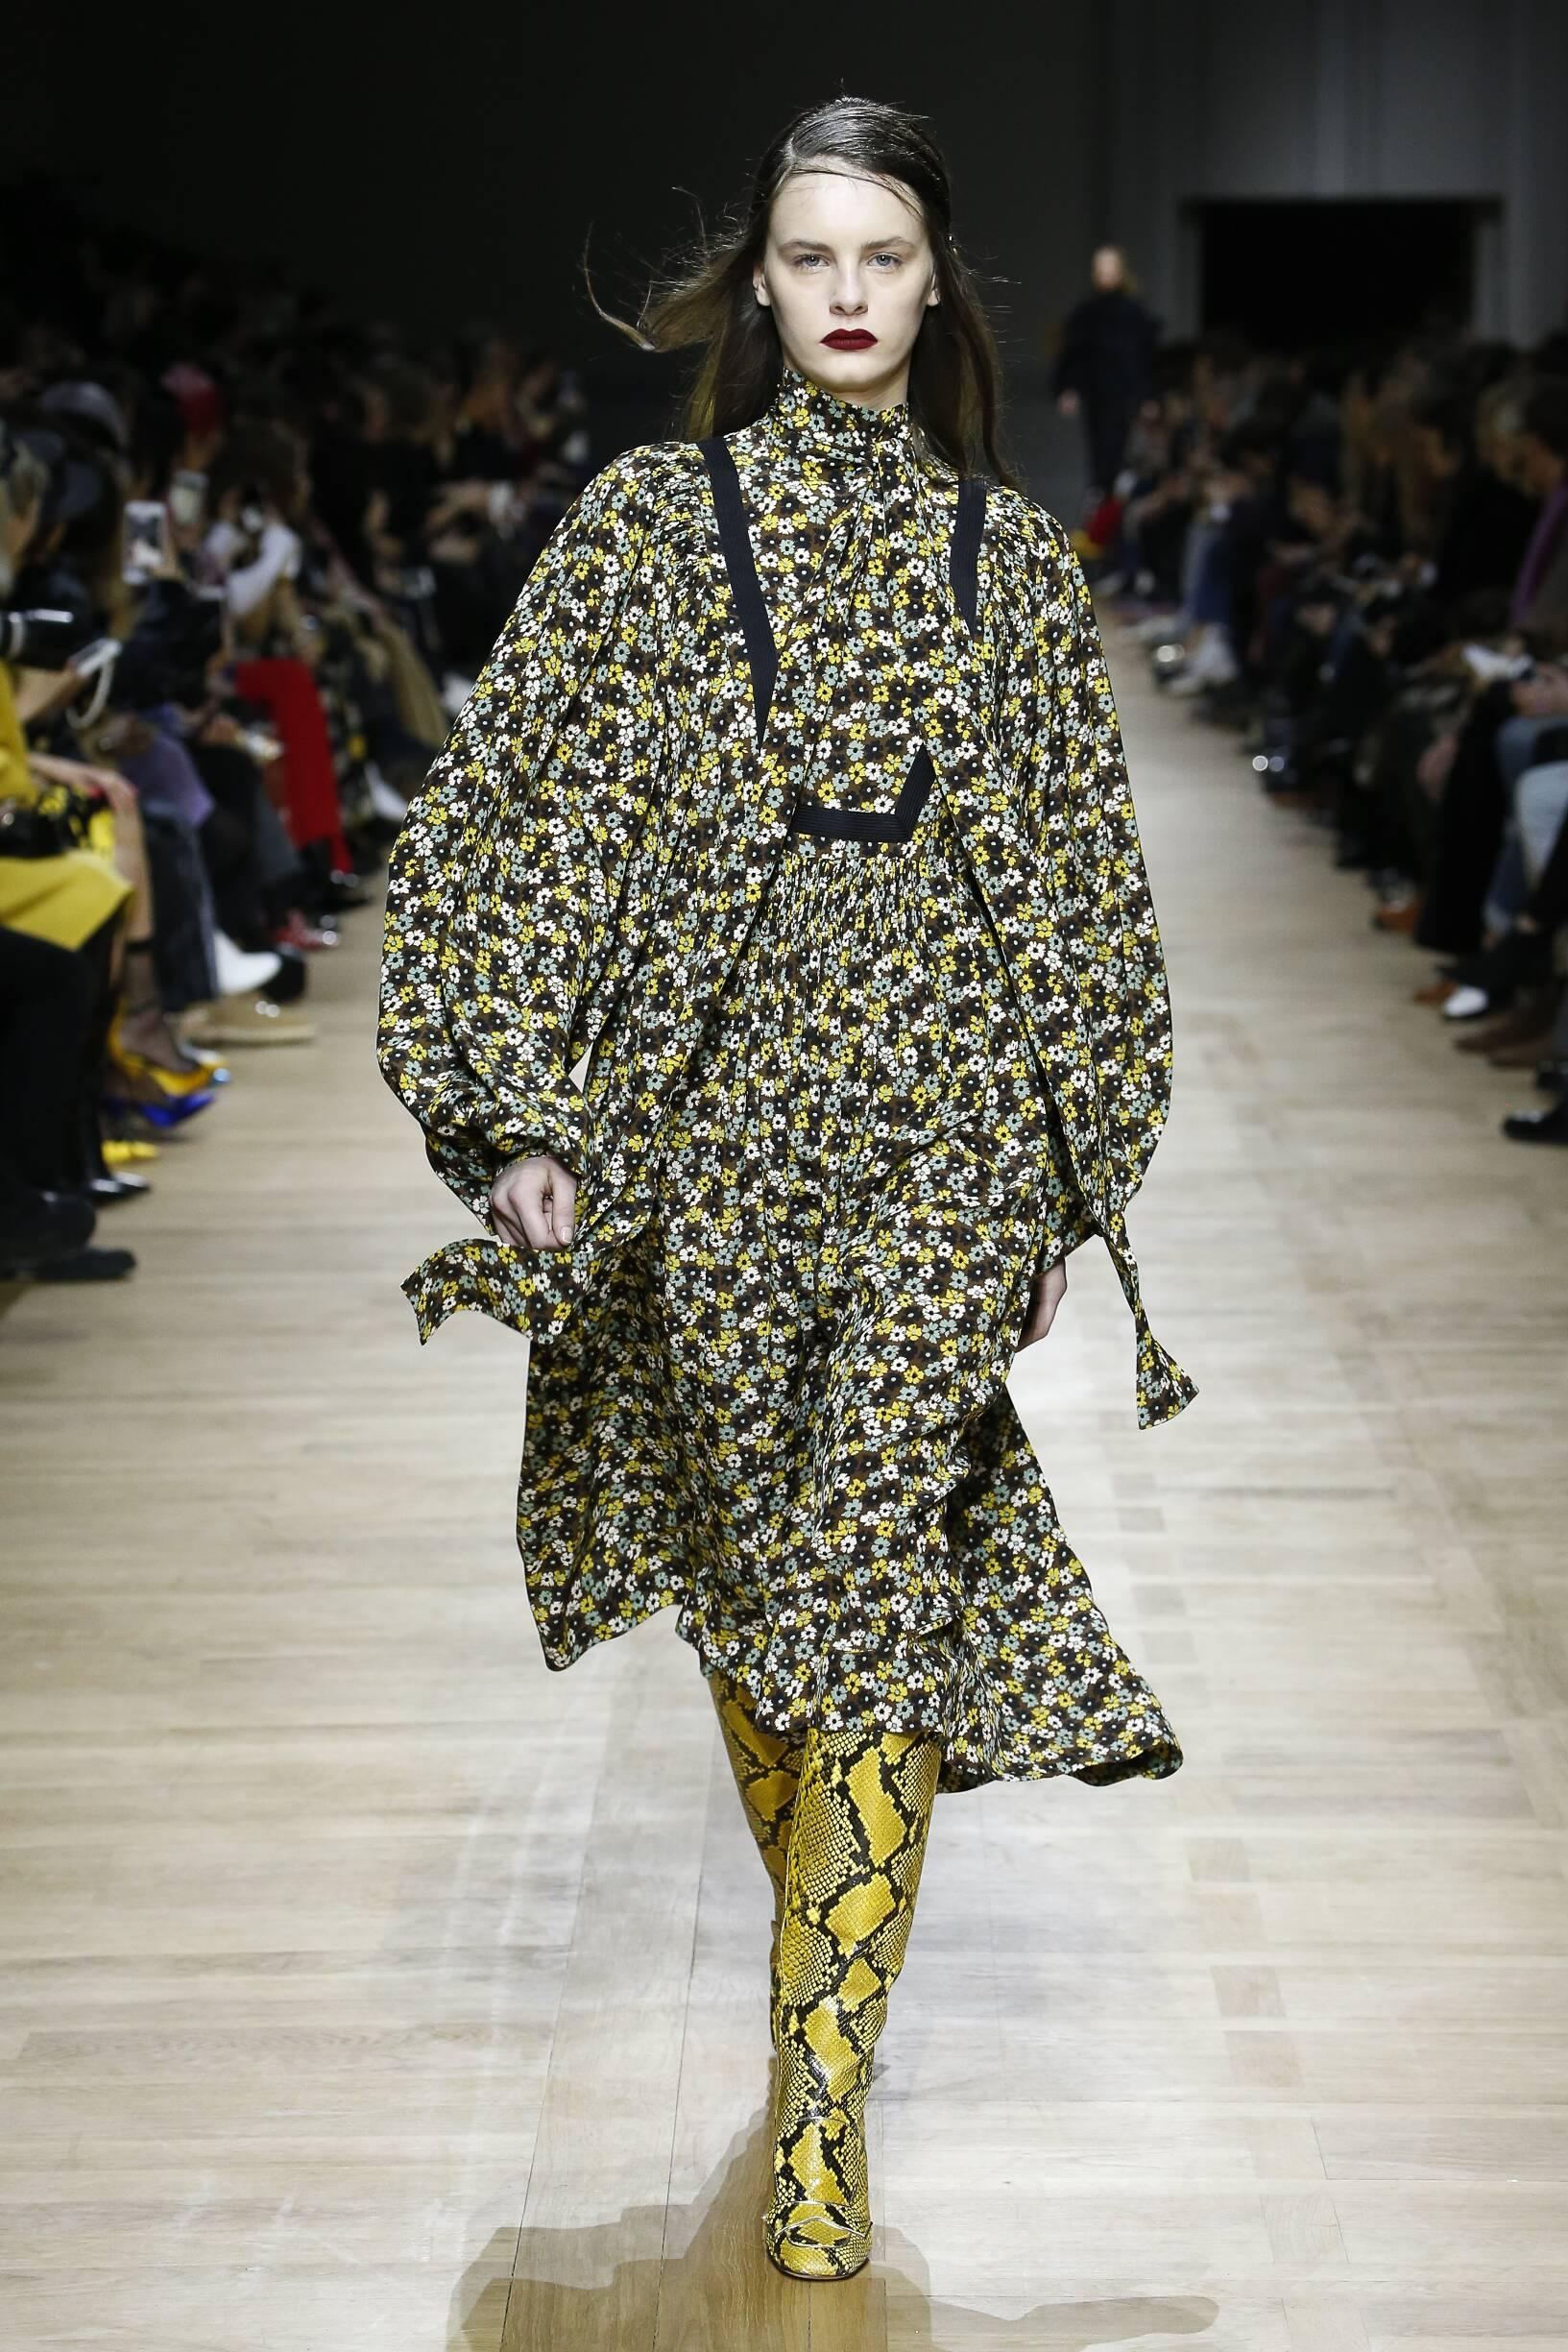 Catwalk Rochas Woman Fashion Show Winter 2018